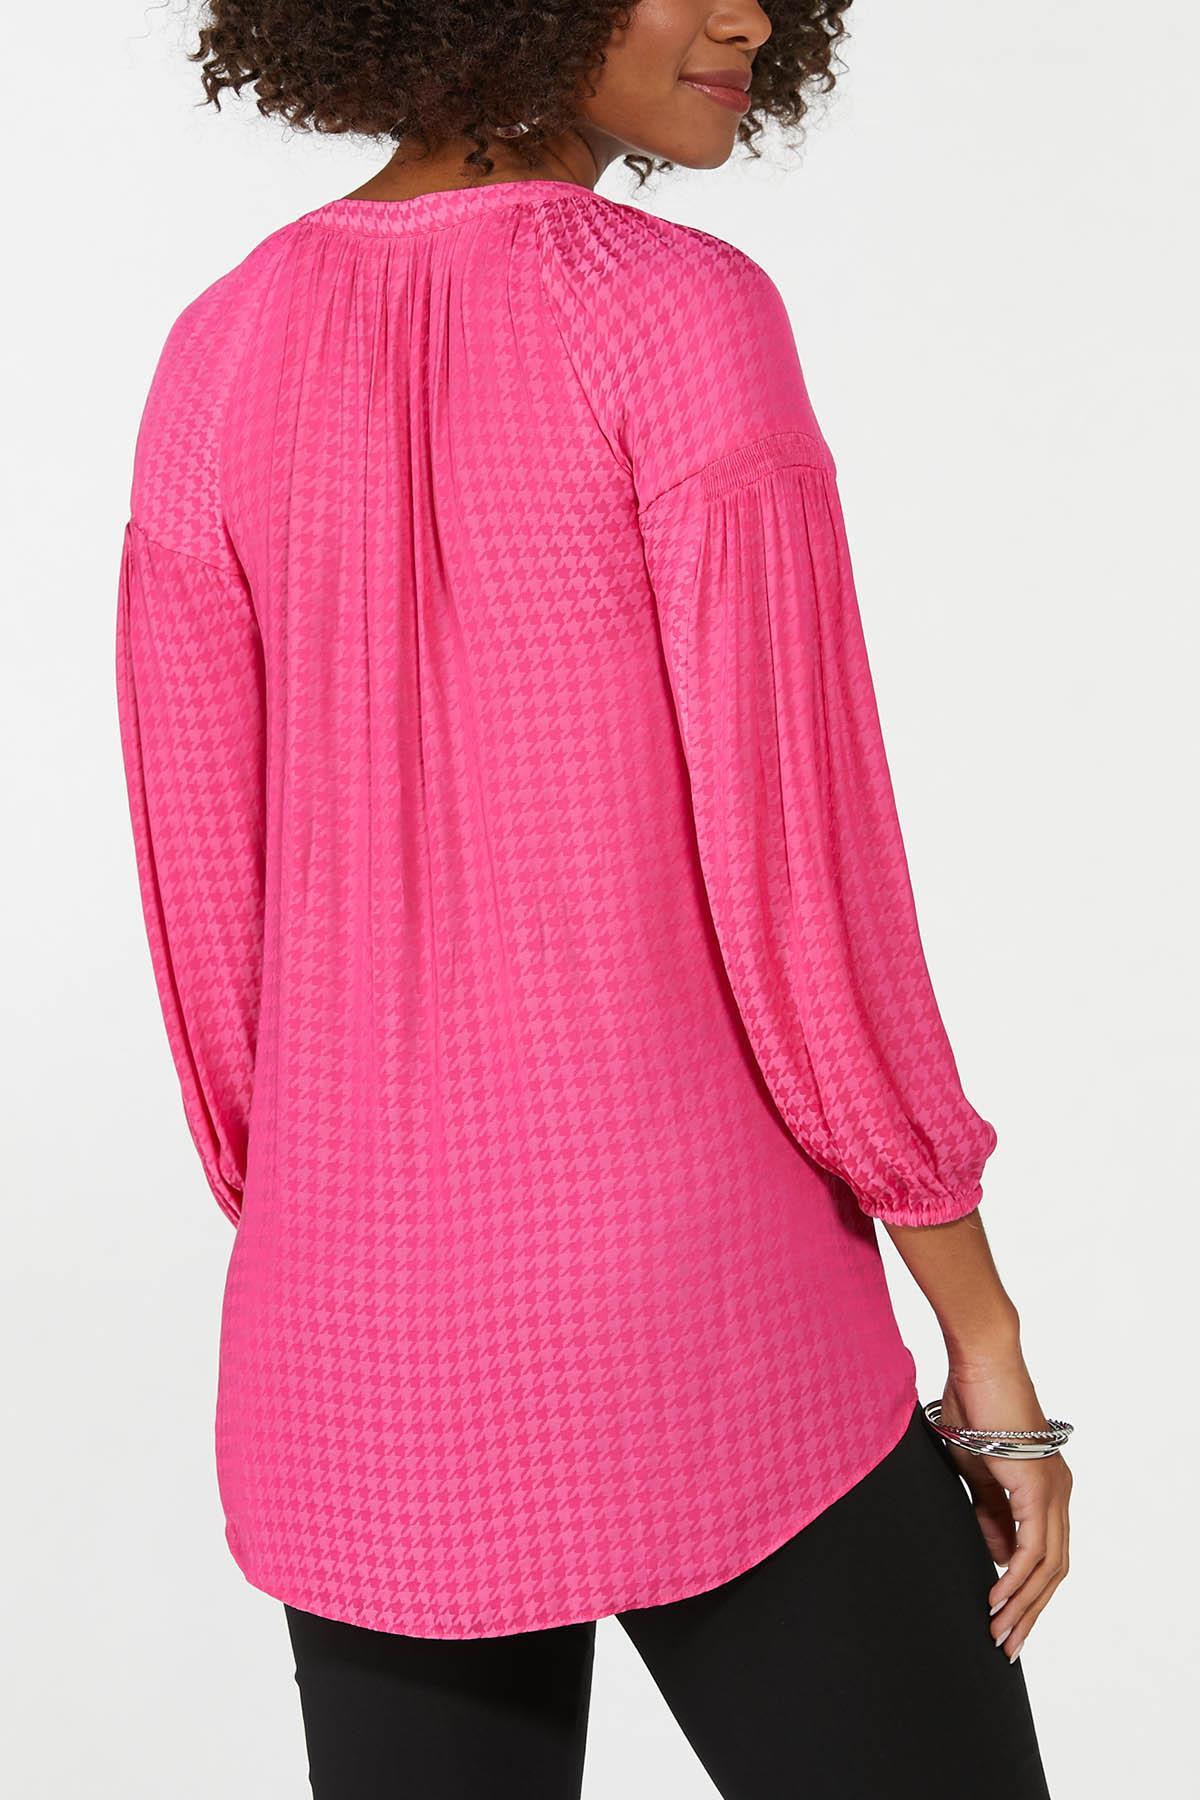 Plus Size Pink Textured Tunic (Item #44706612)